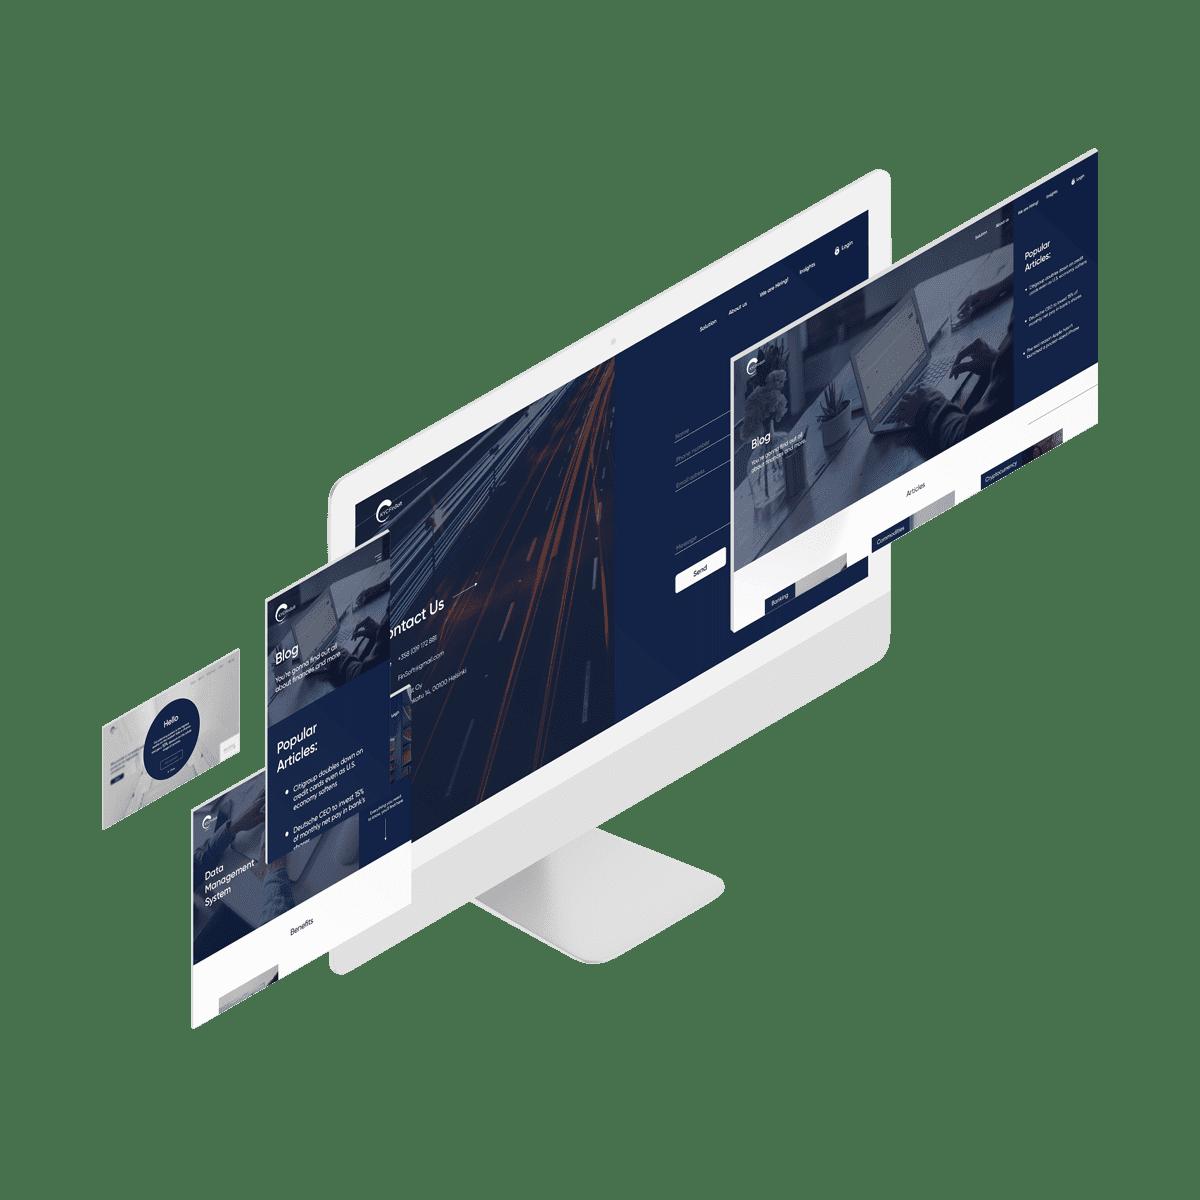 KYC service on monitors